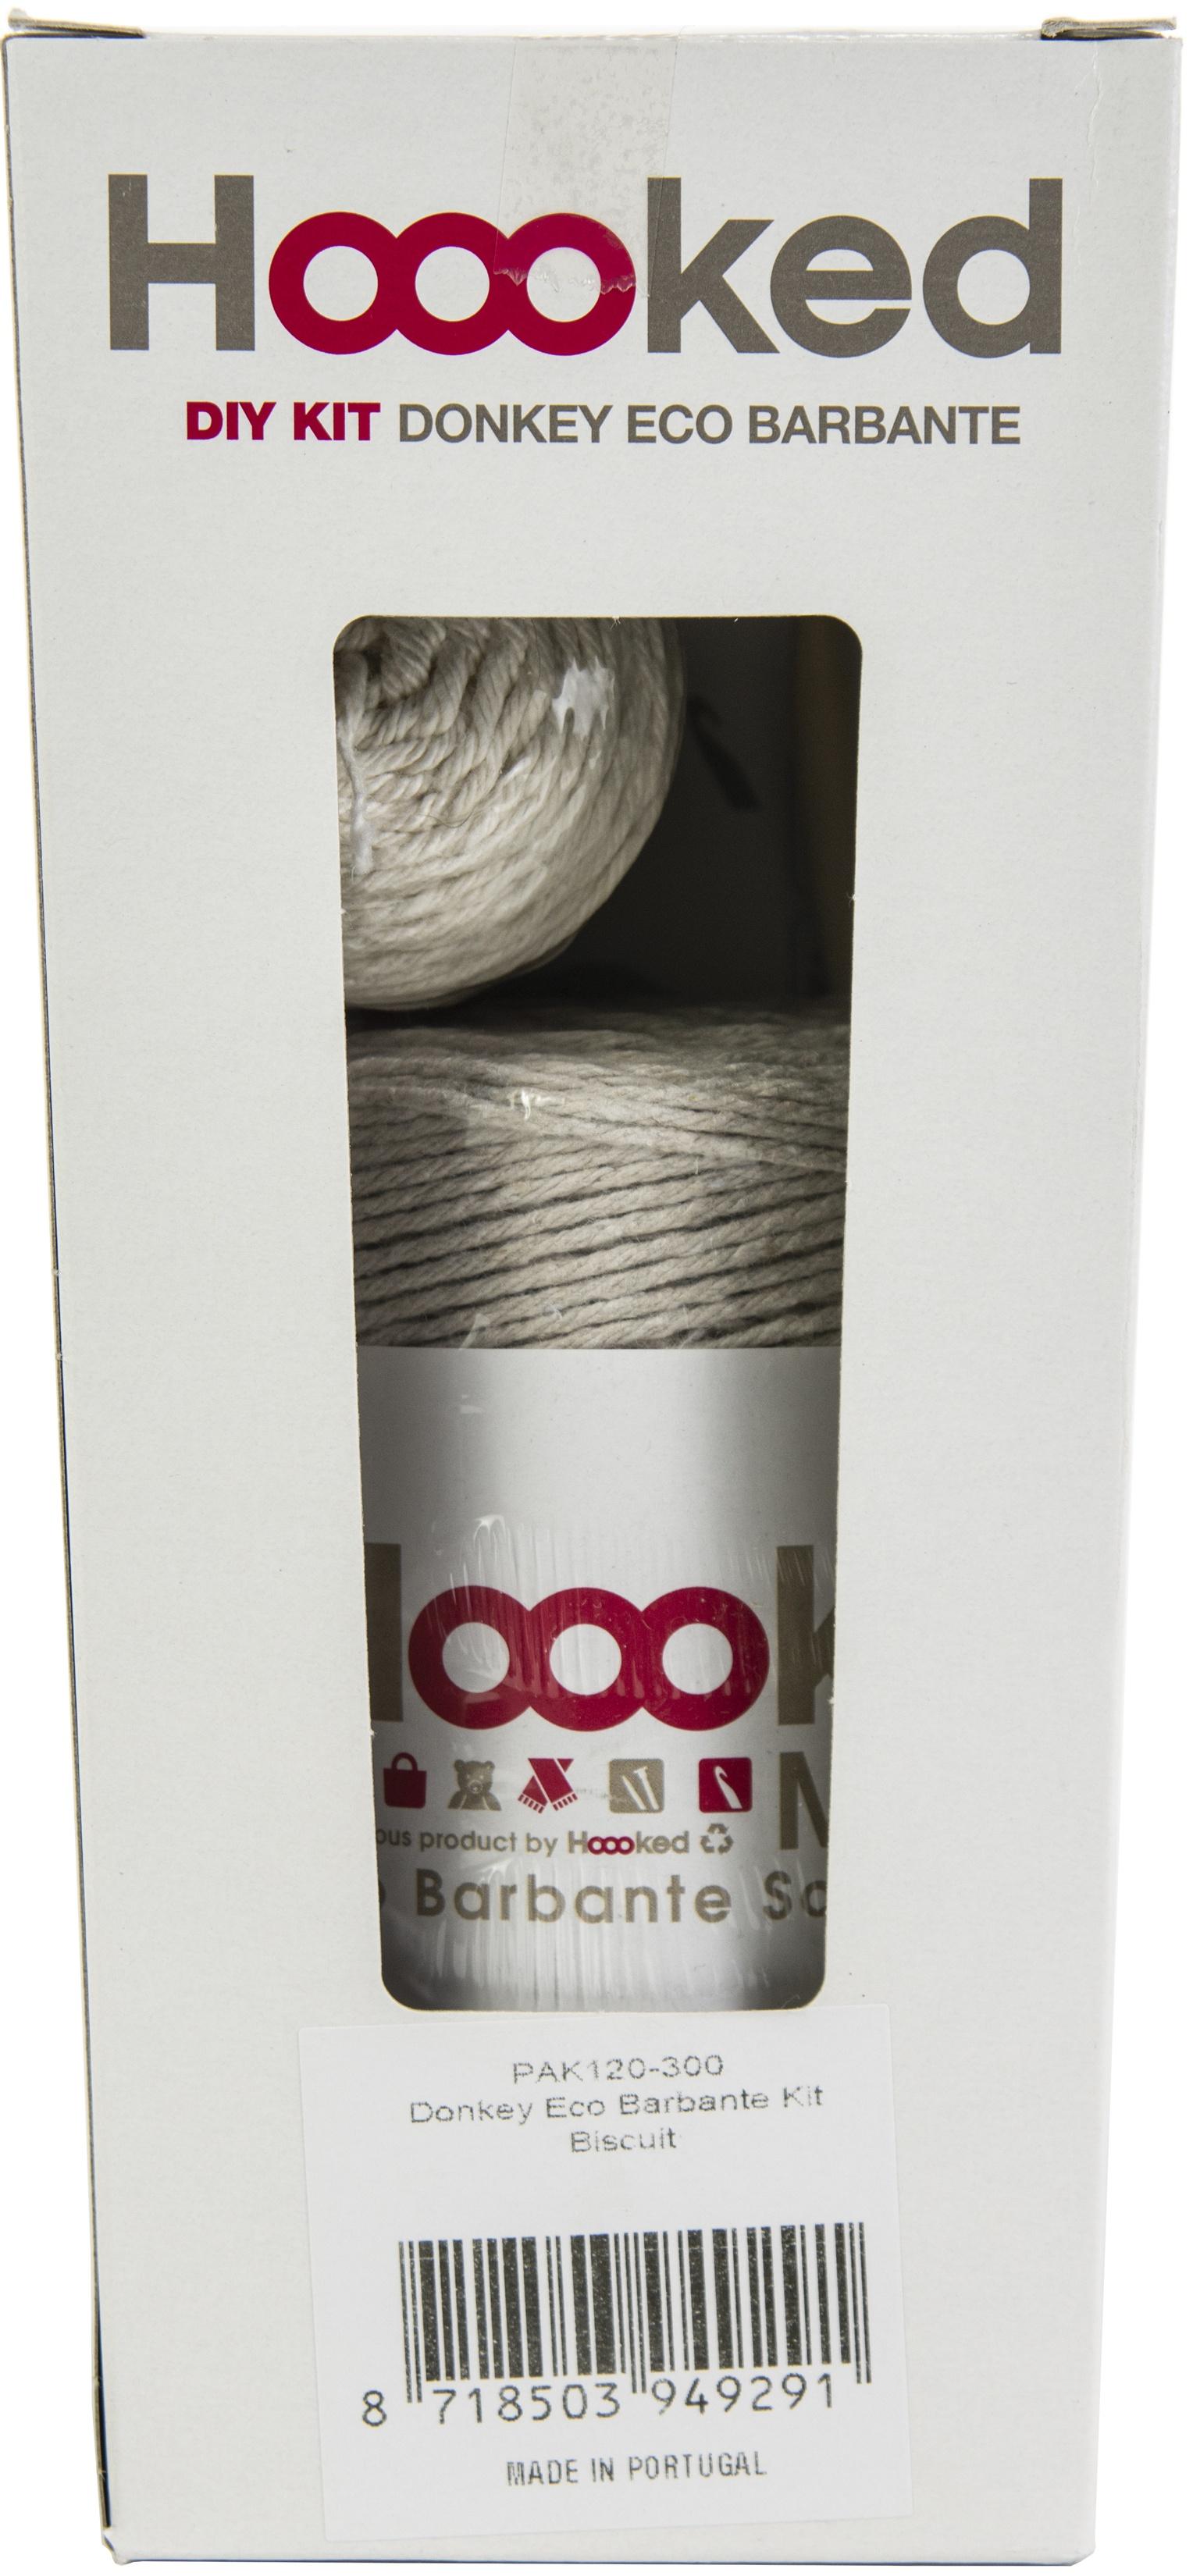 Hoooked Donkey Joe Yarn Kit W/Eco Barbante Yarn-Biscuit